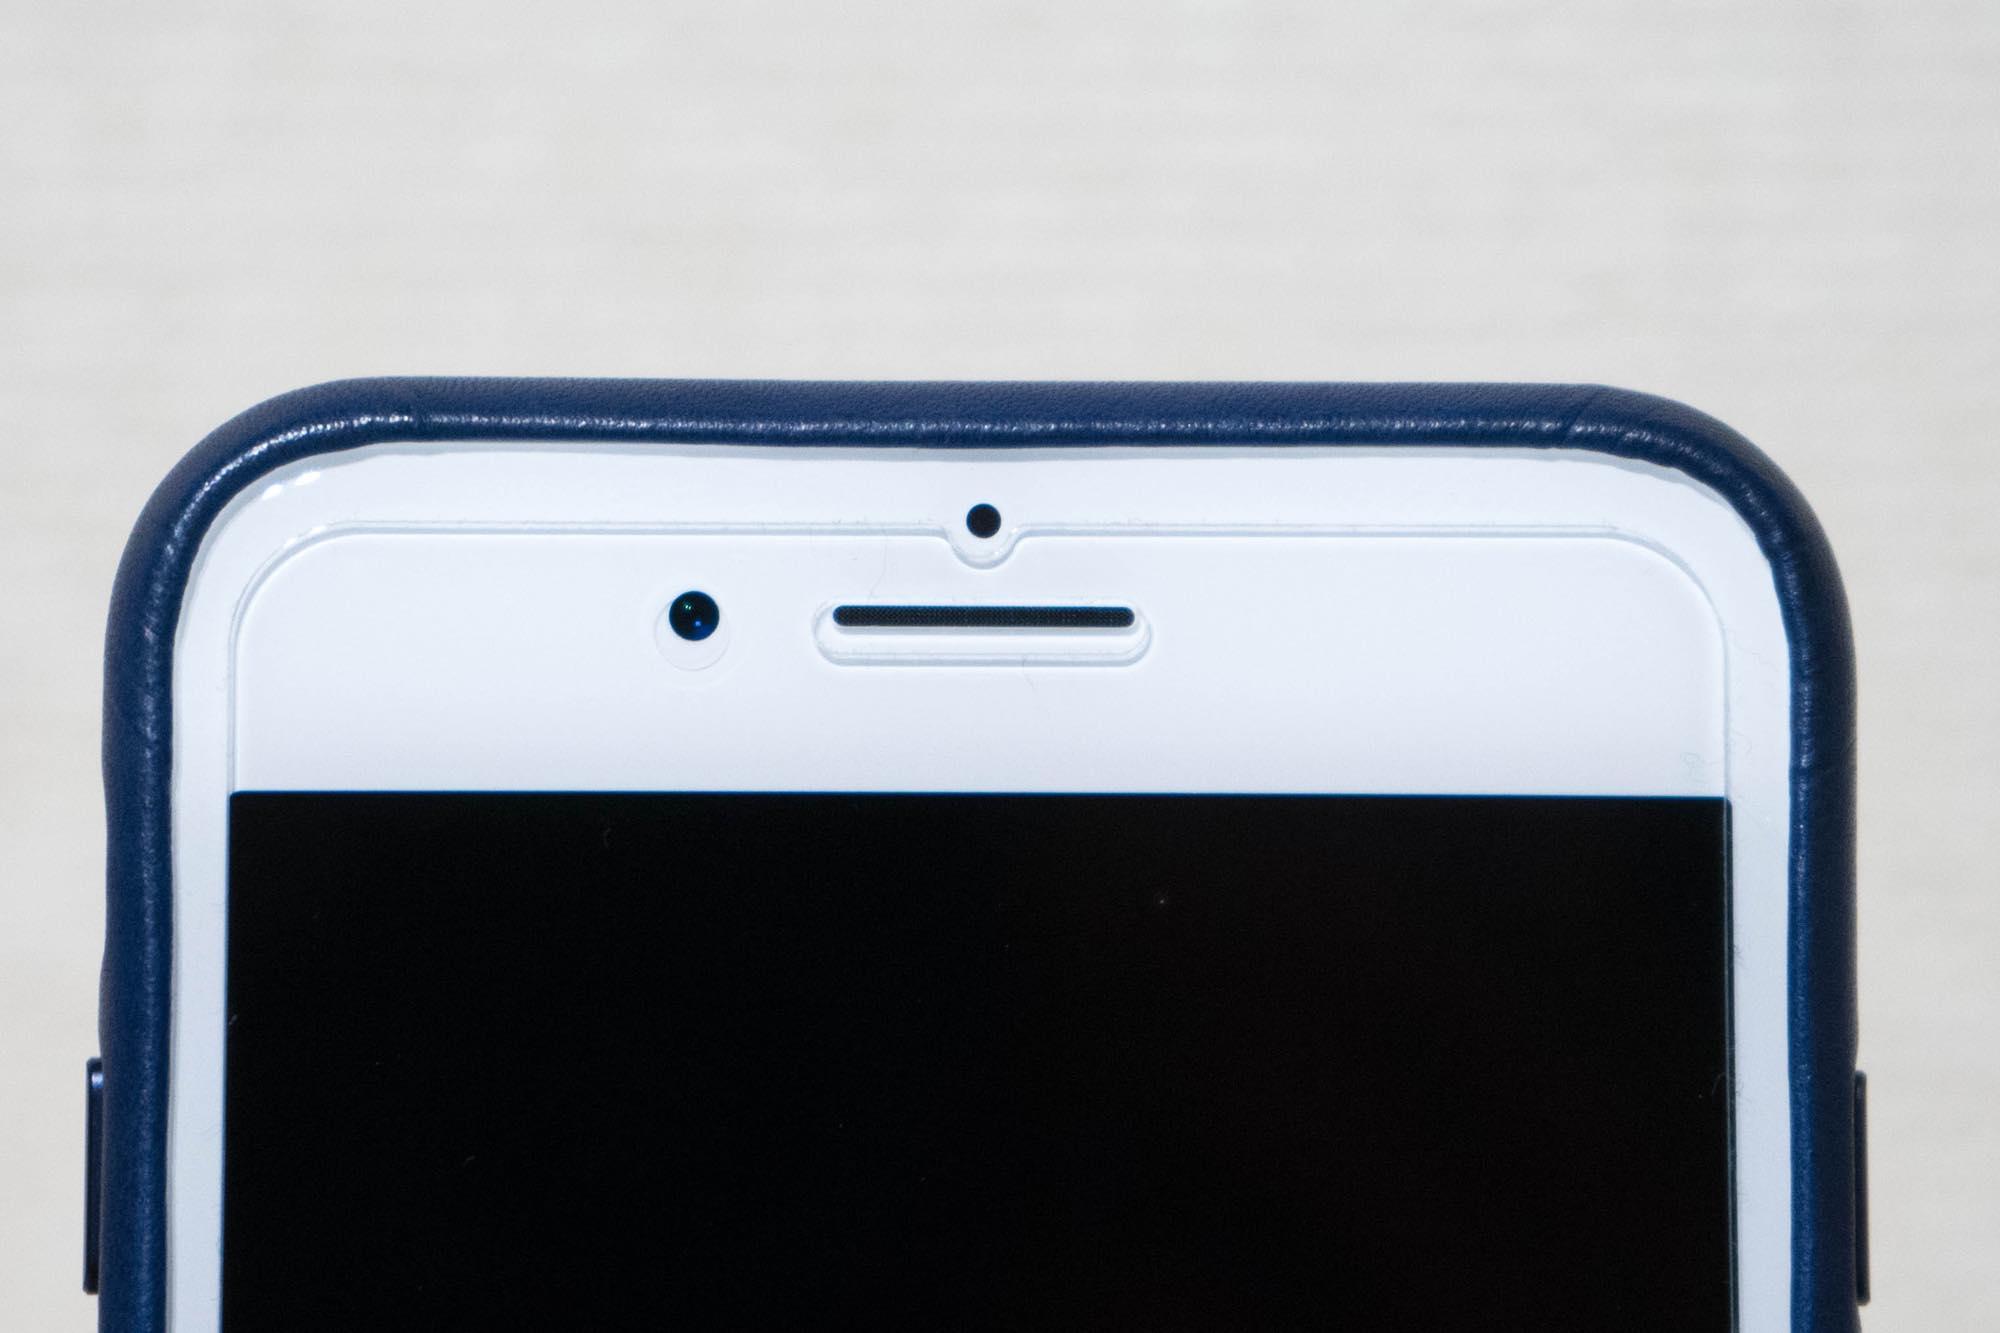 iphone7plus-leathercase-midnightblue9